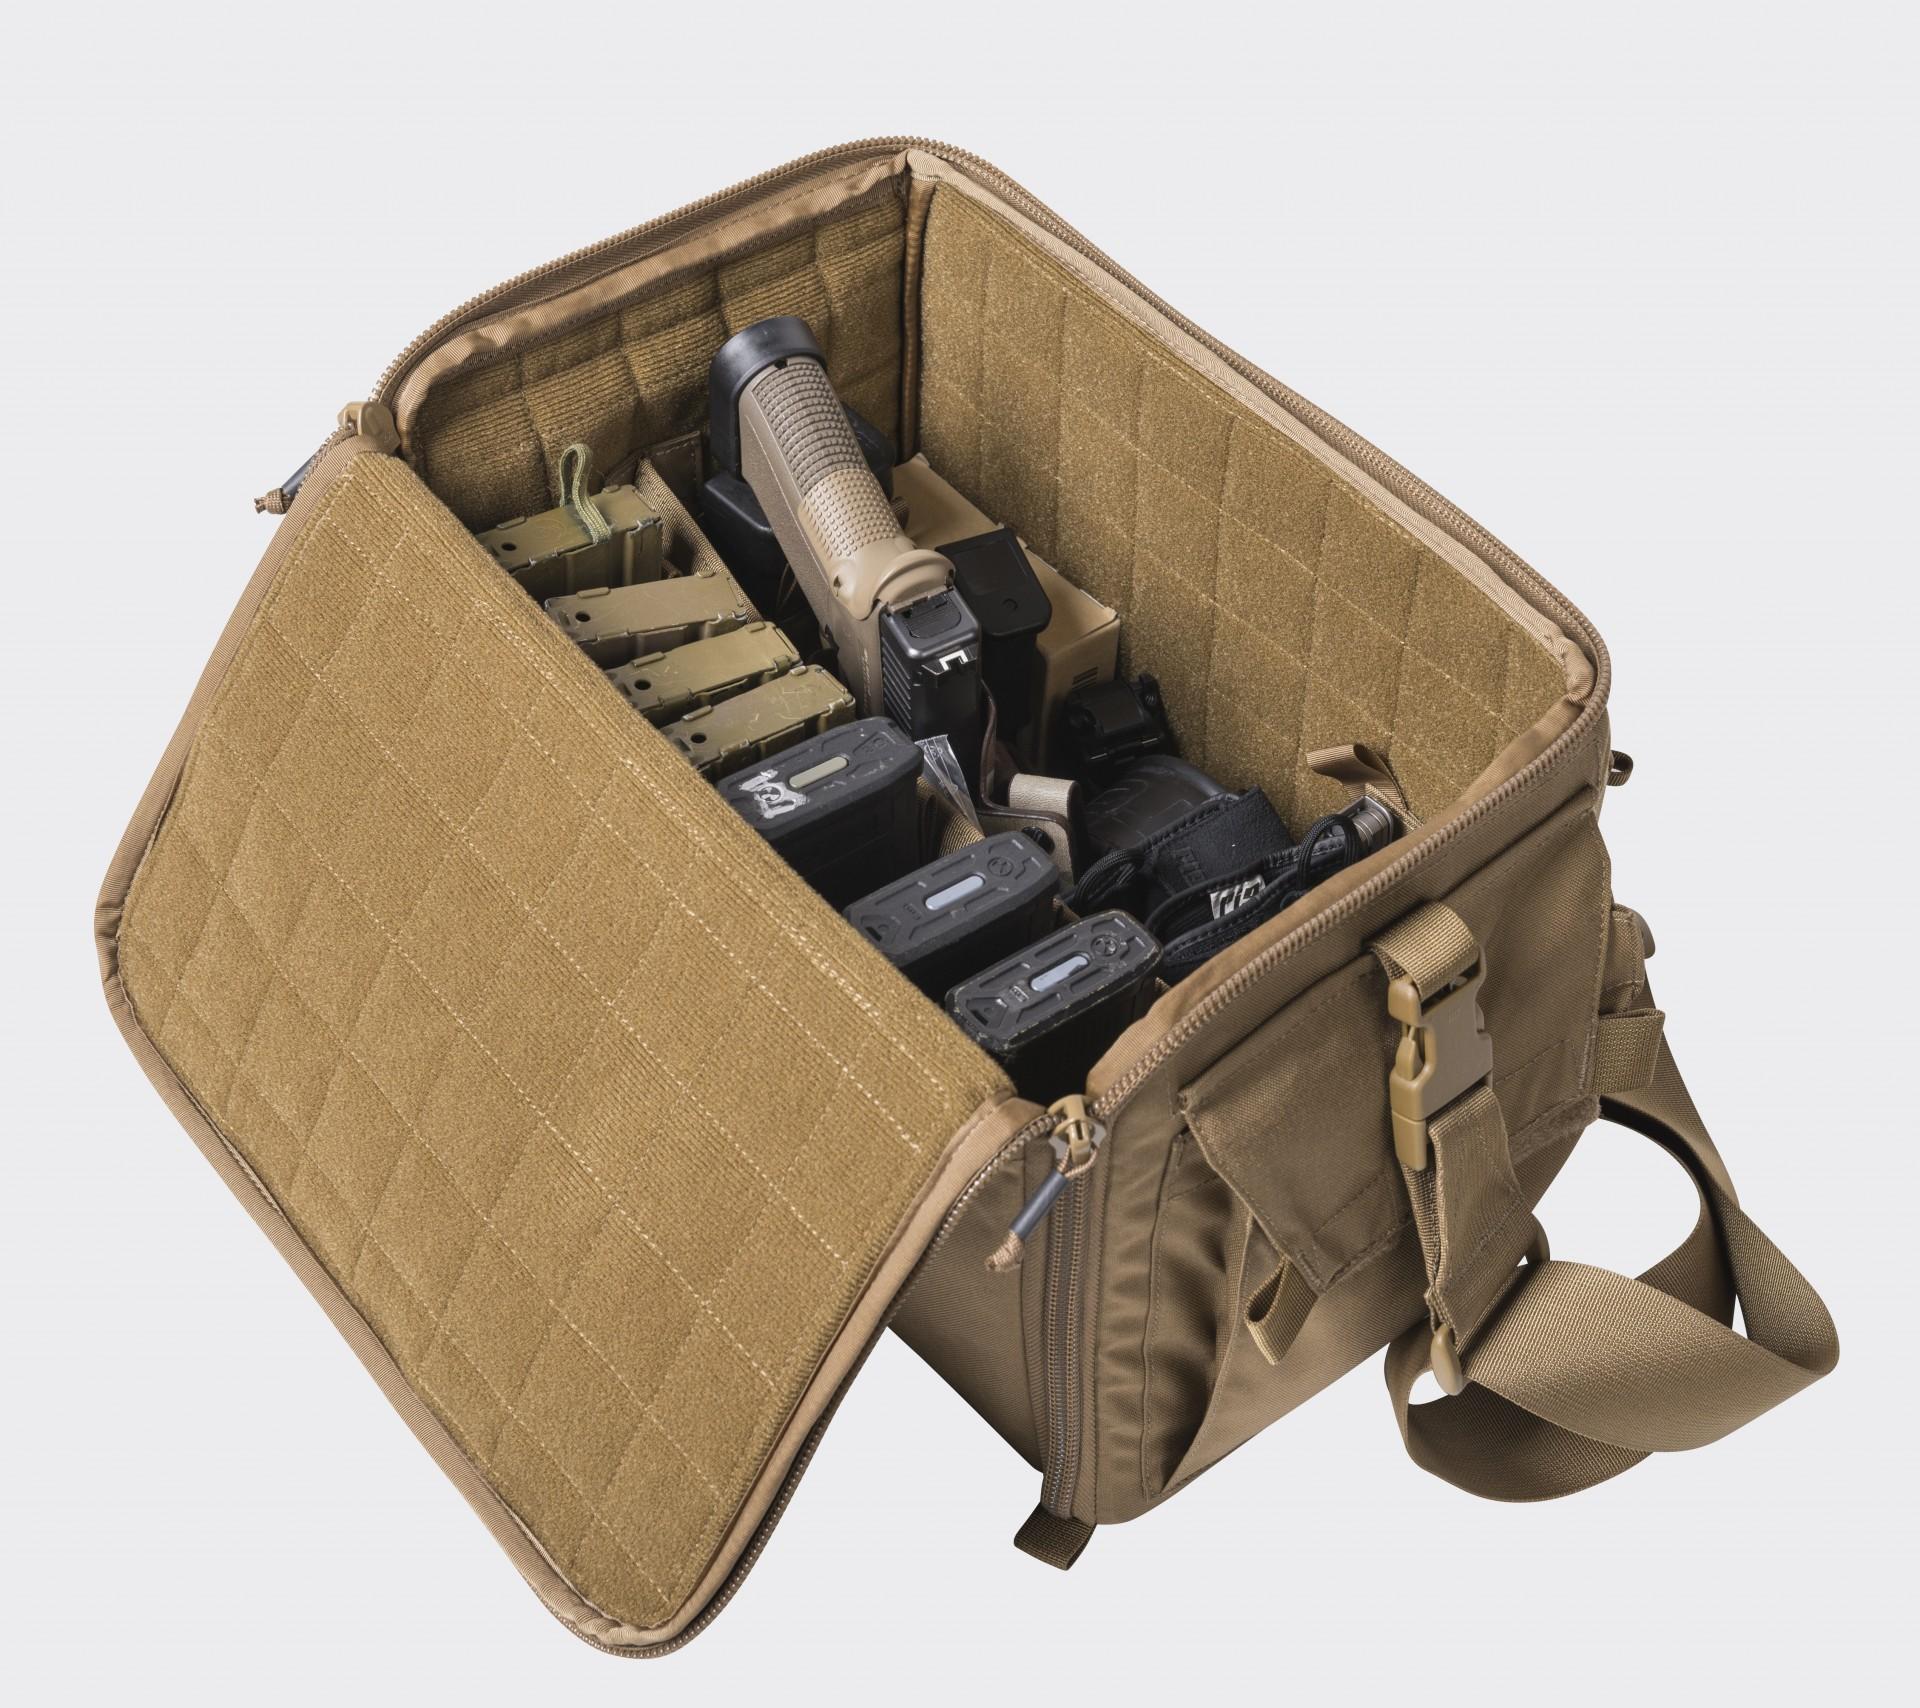 Saco Hel. Range®